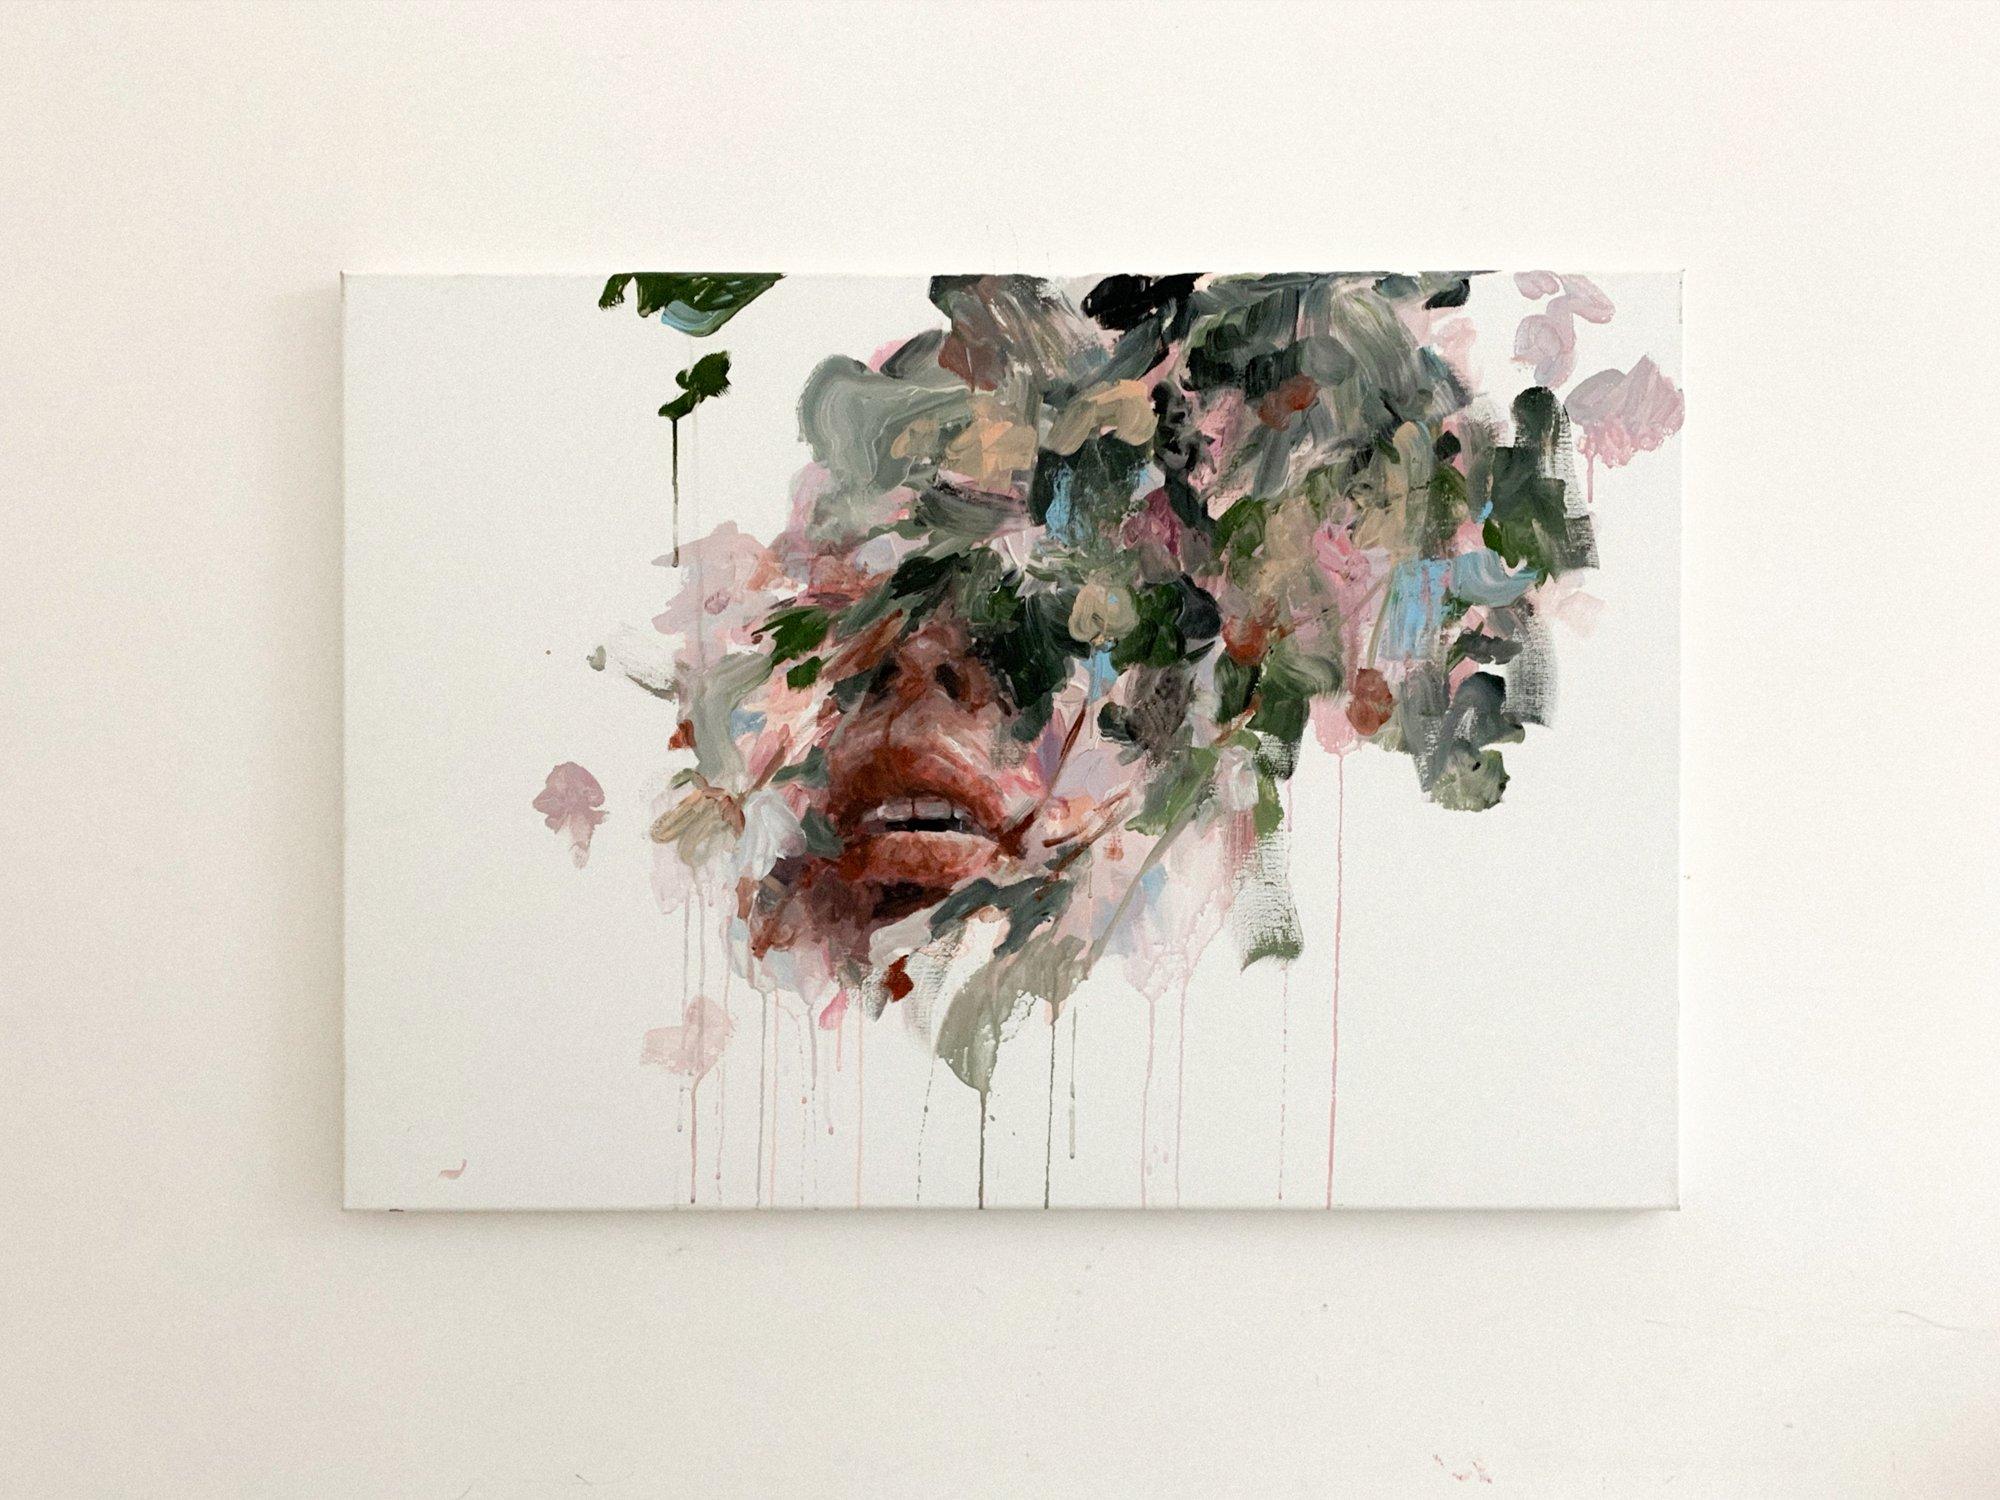 Agnes-Cecile botanica I